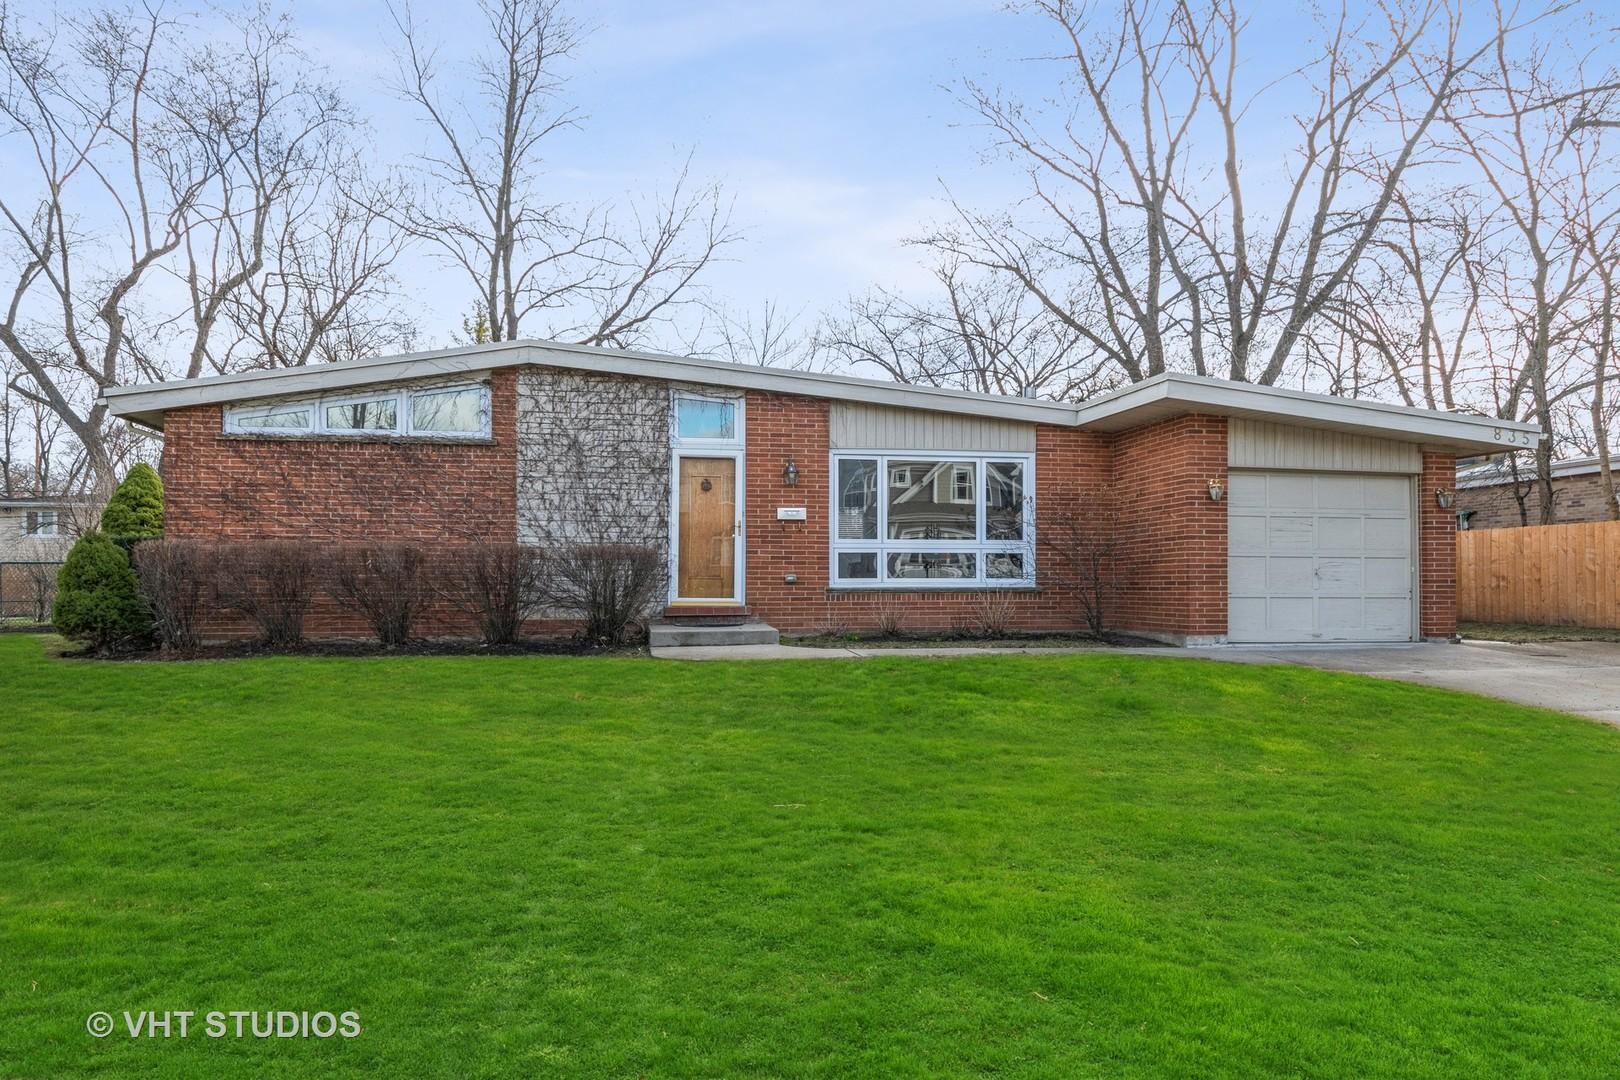 835 Virginia Road, Highland Park, IL 60035